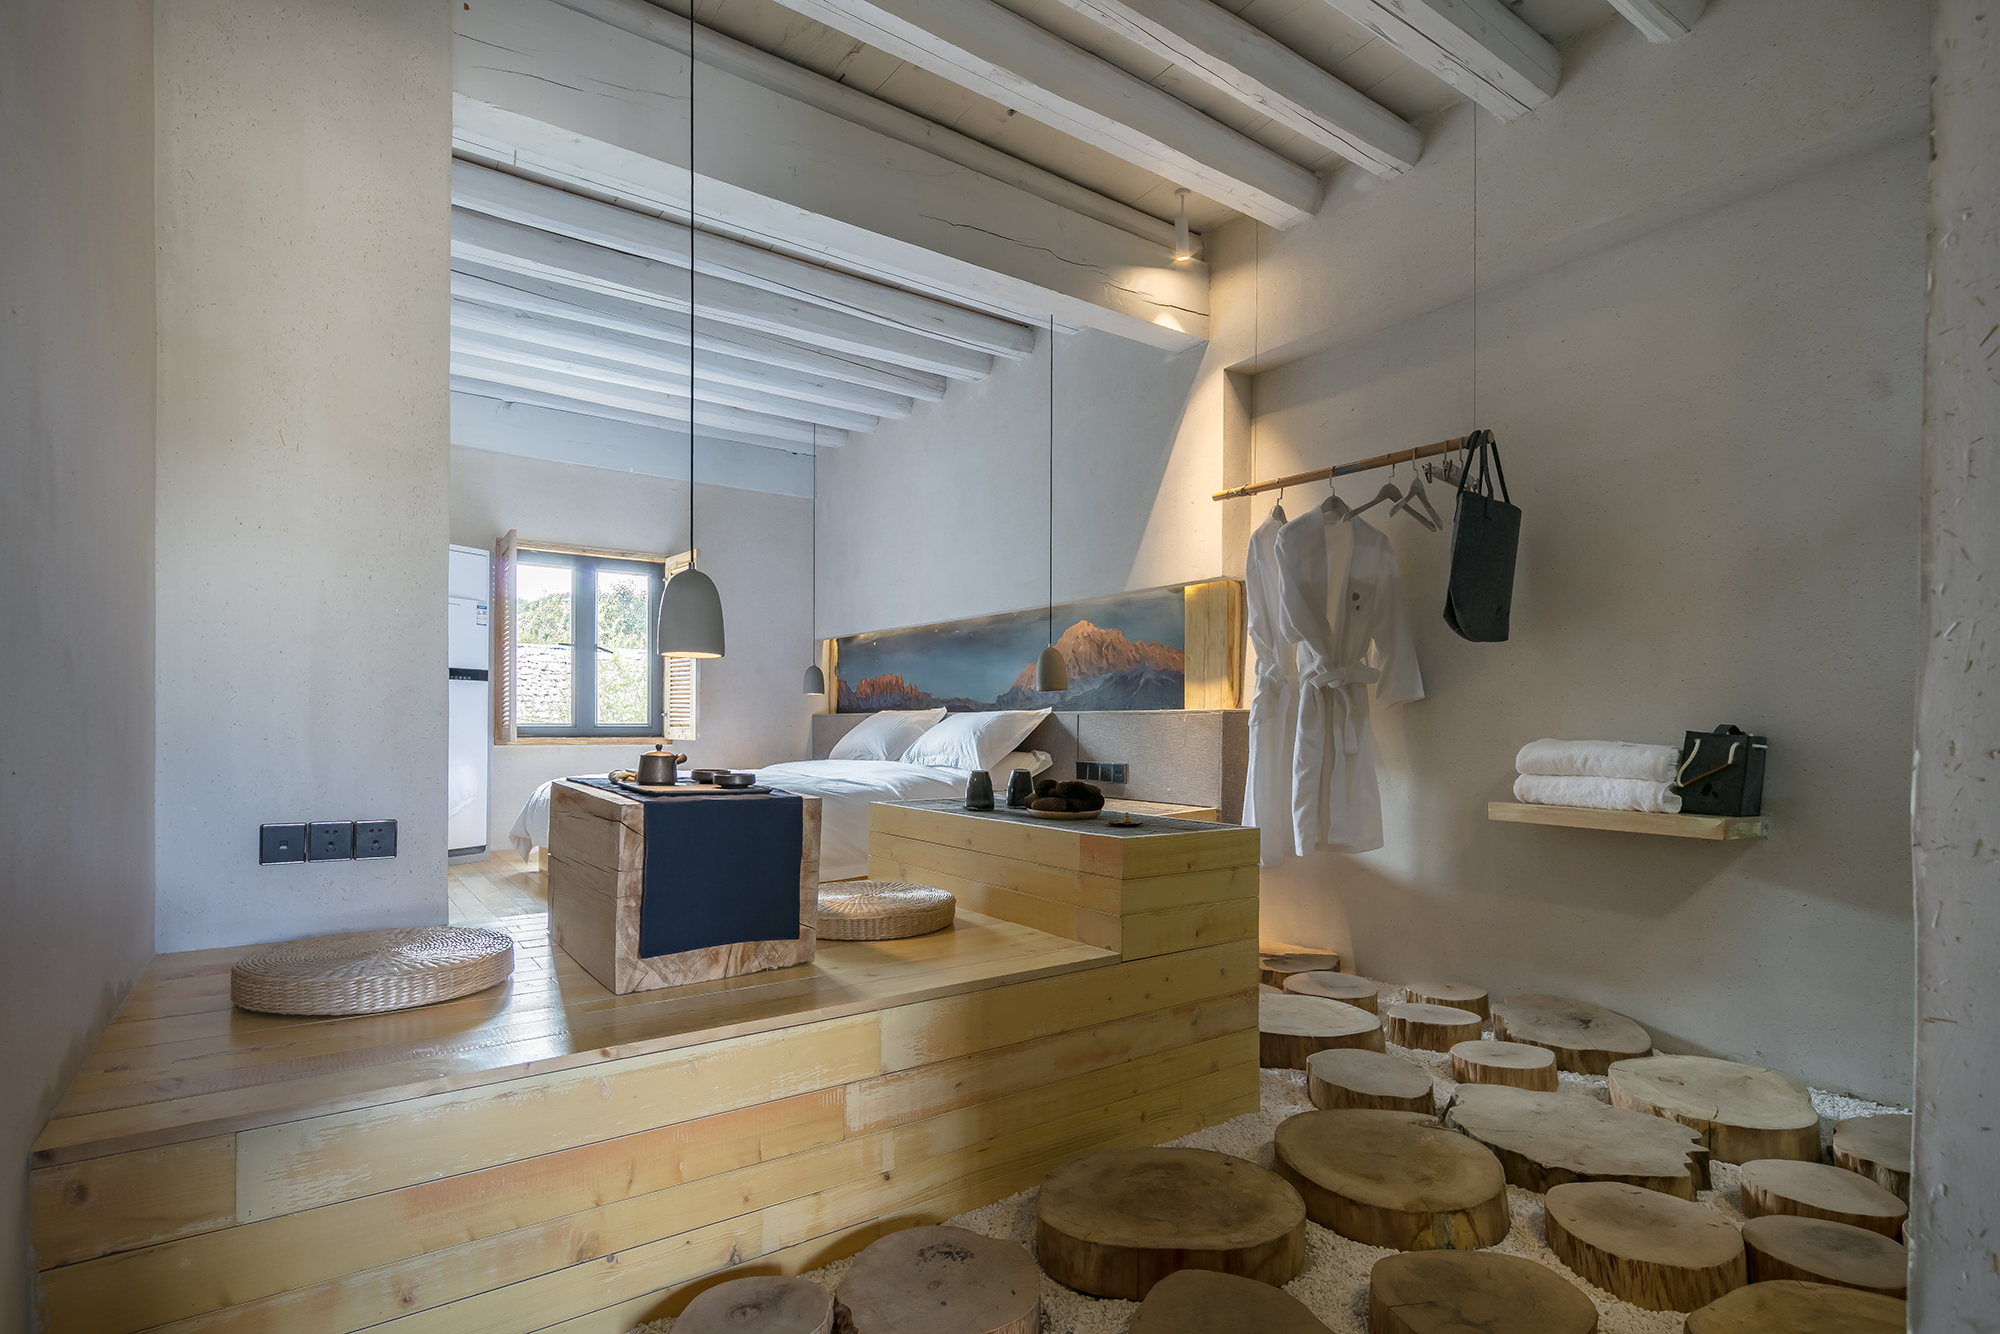 Gallery of karesansui yiduan shanghai interior design 20 for Interior design agency shanghai